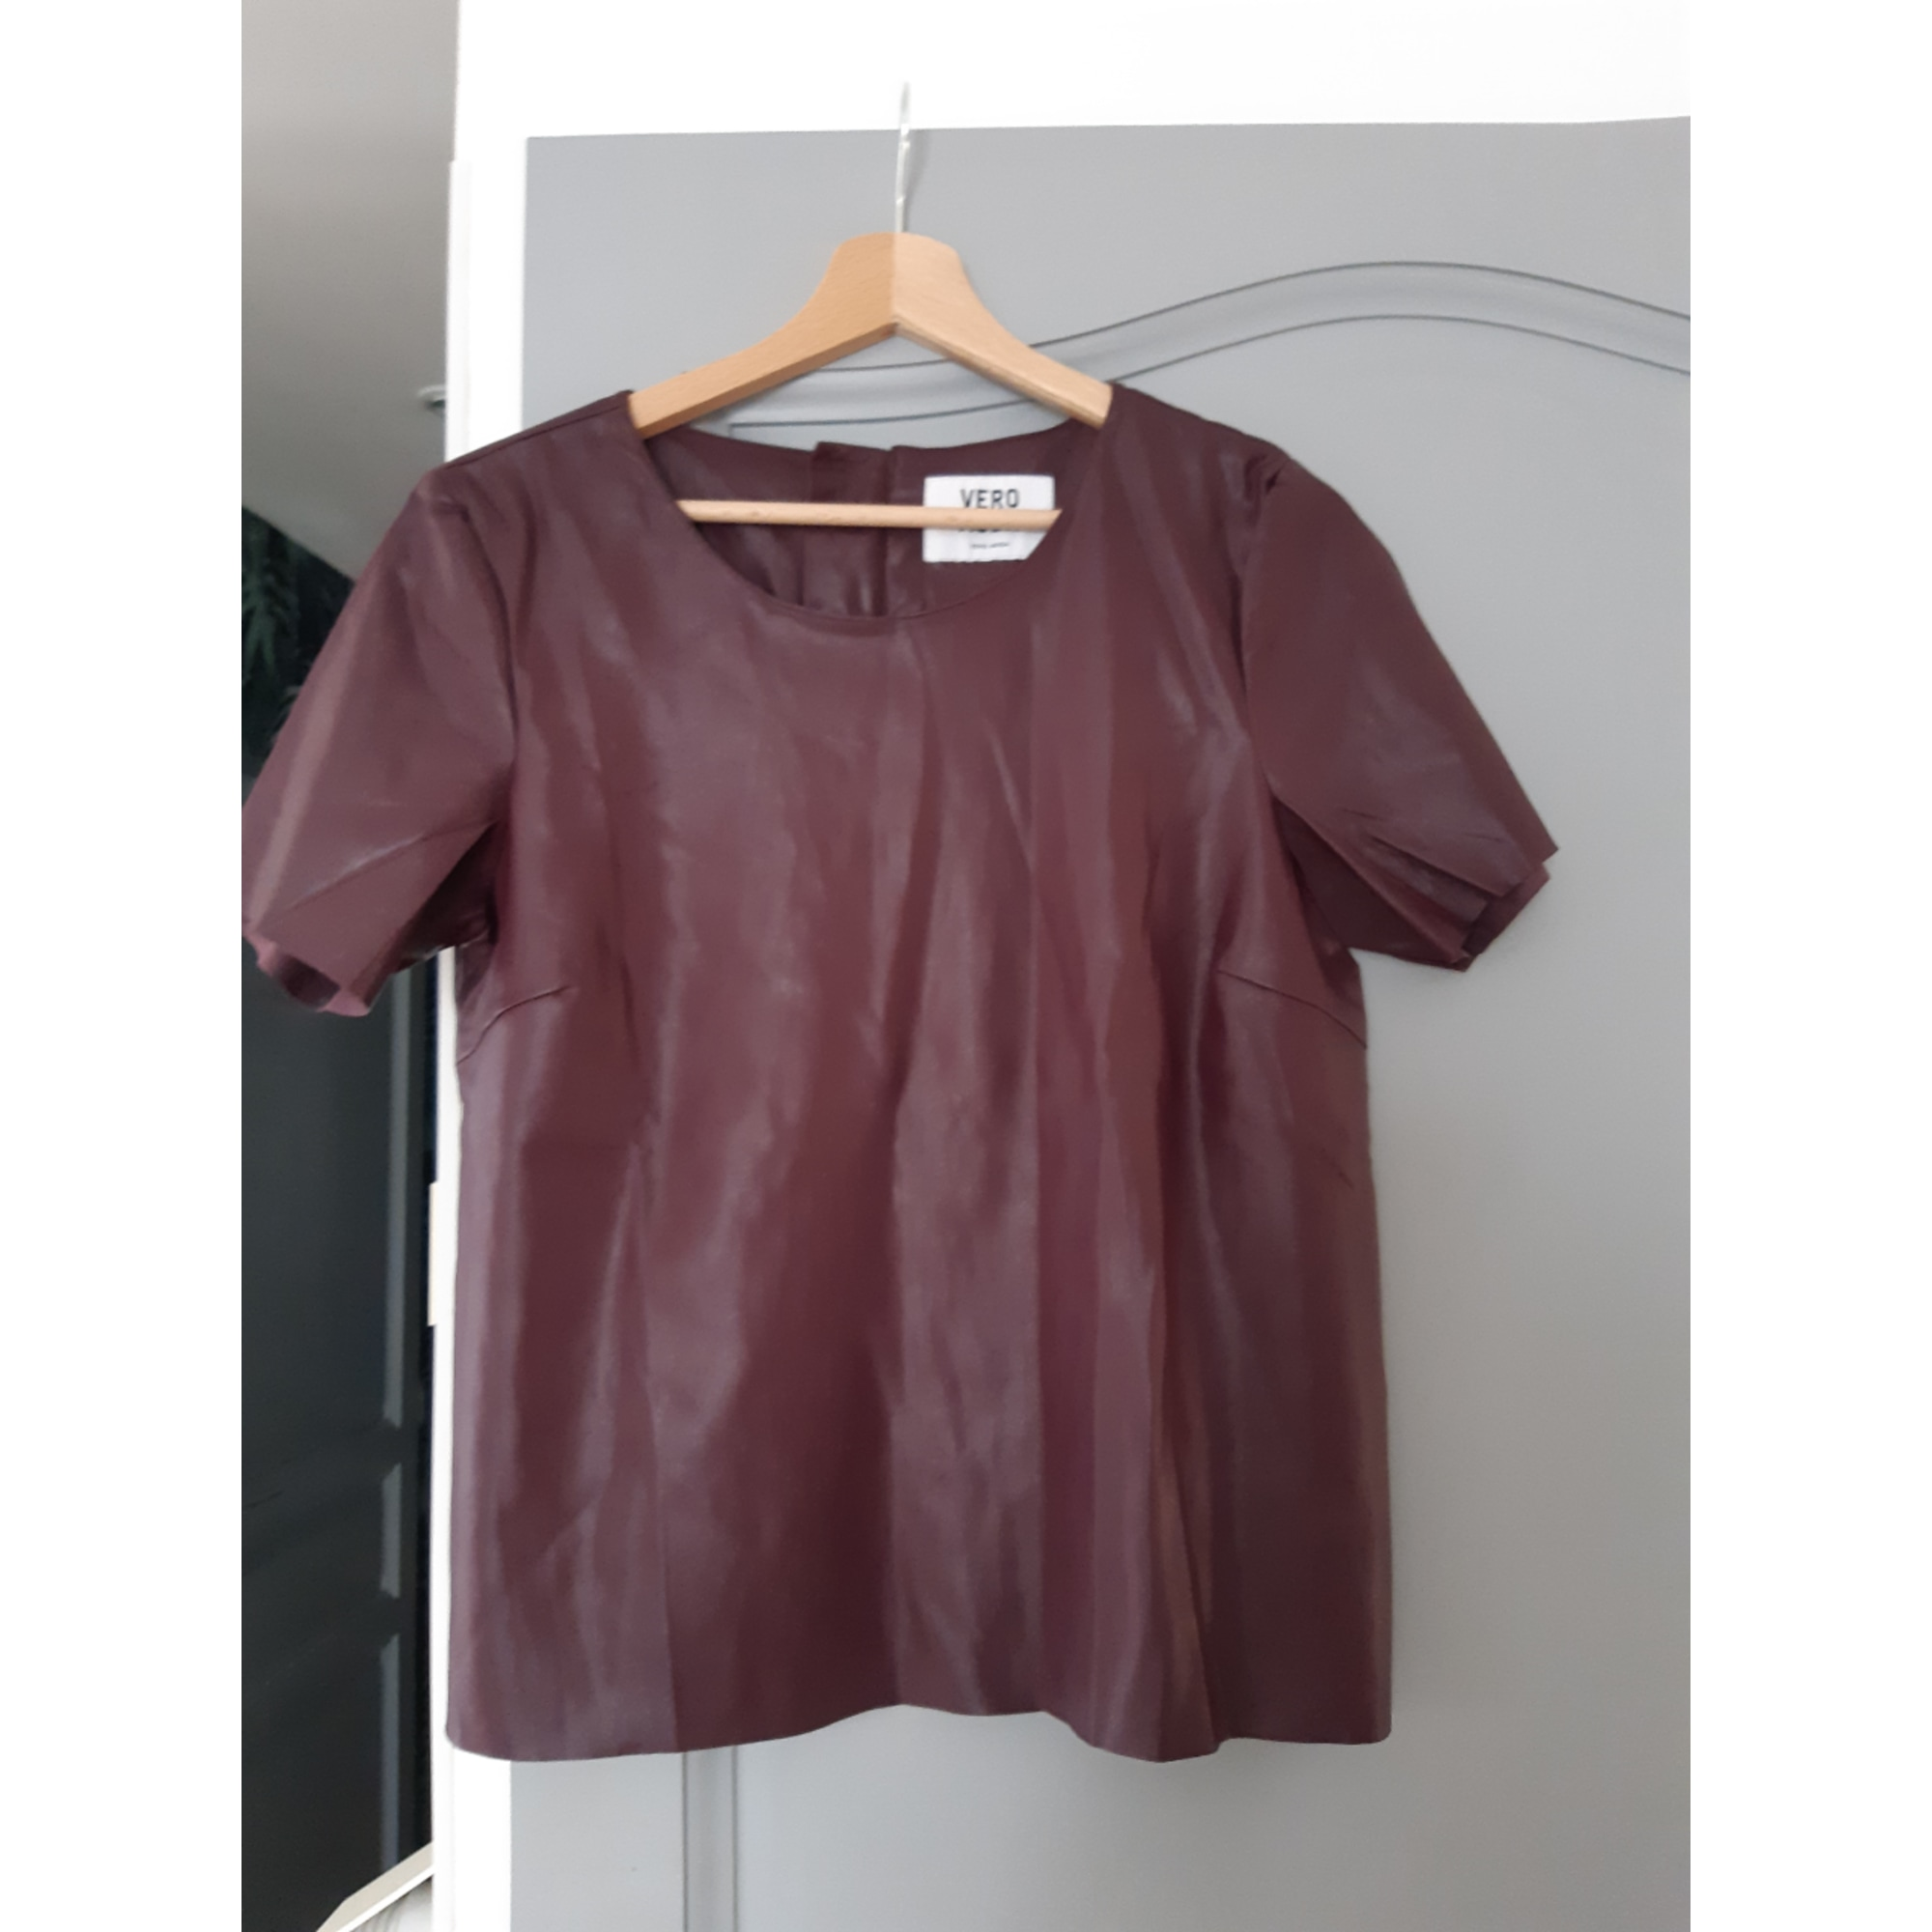 Top, tee-shirt VERO MODA Rouge, bordeaux